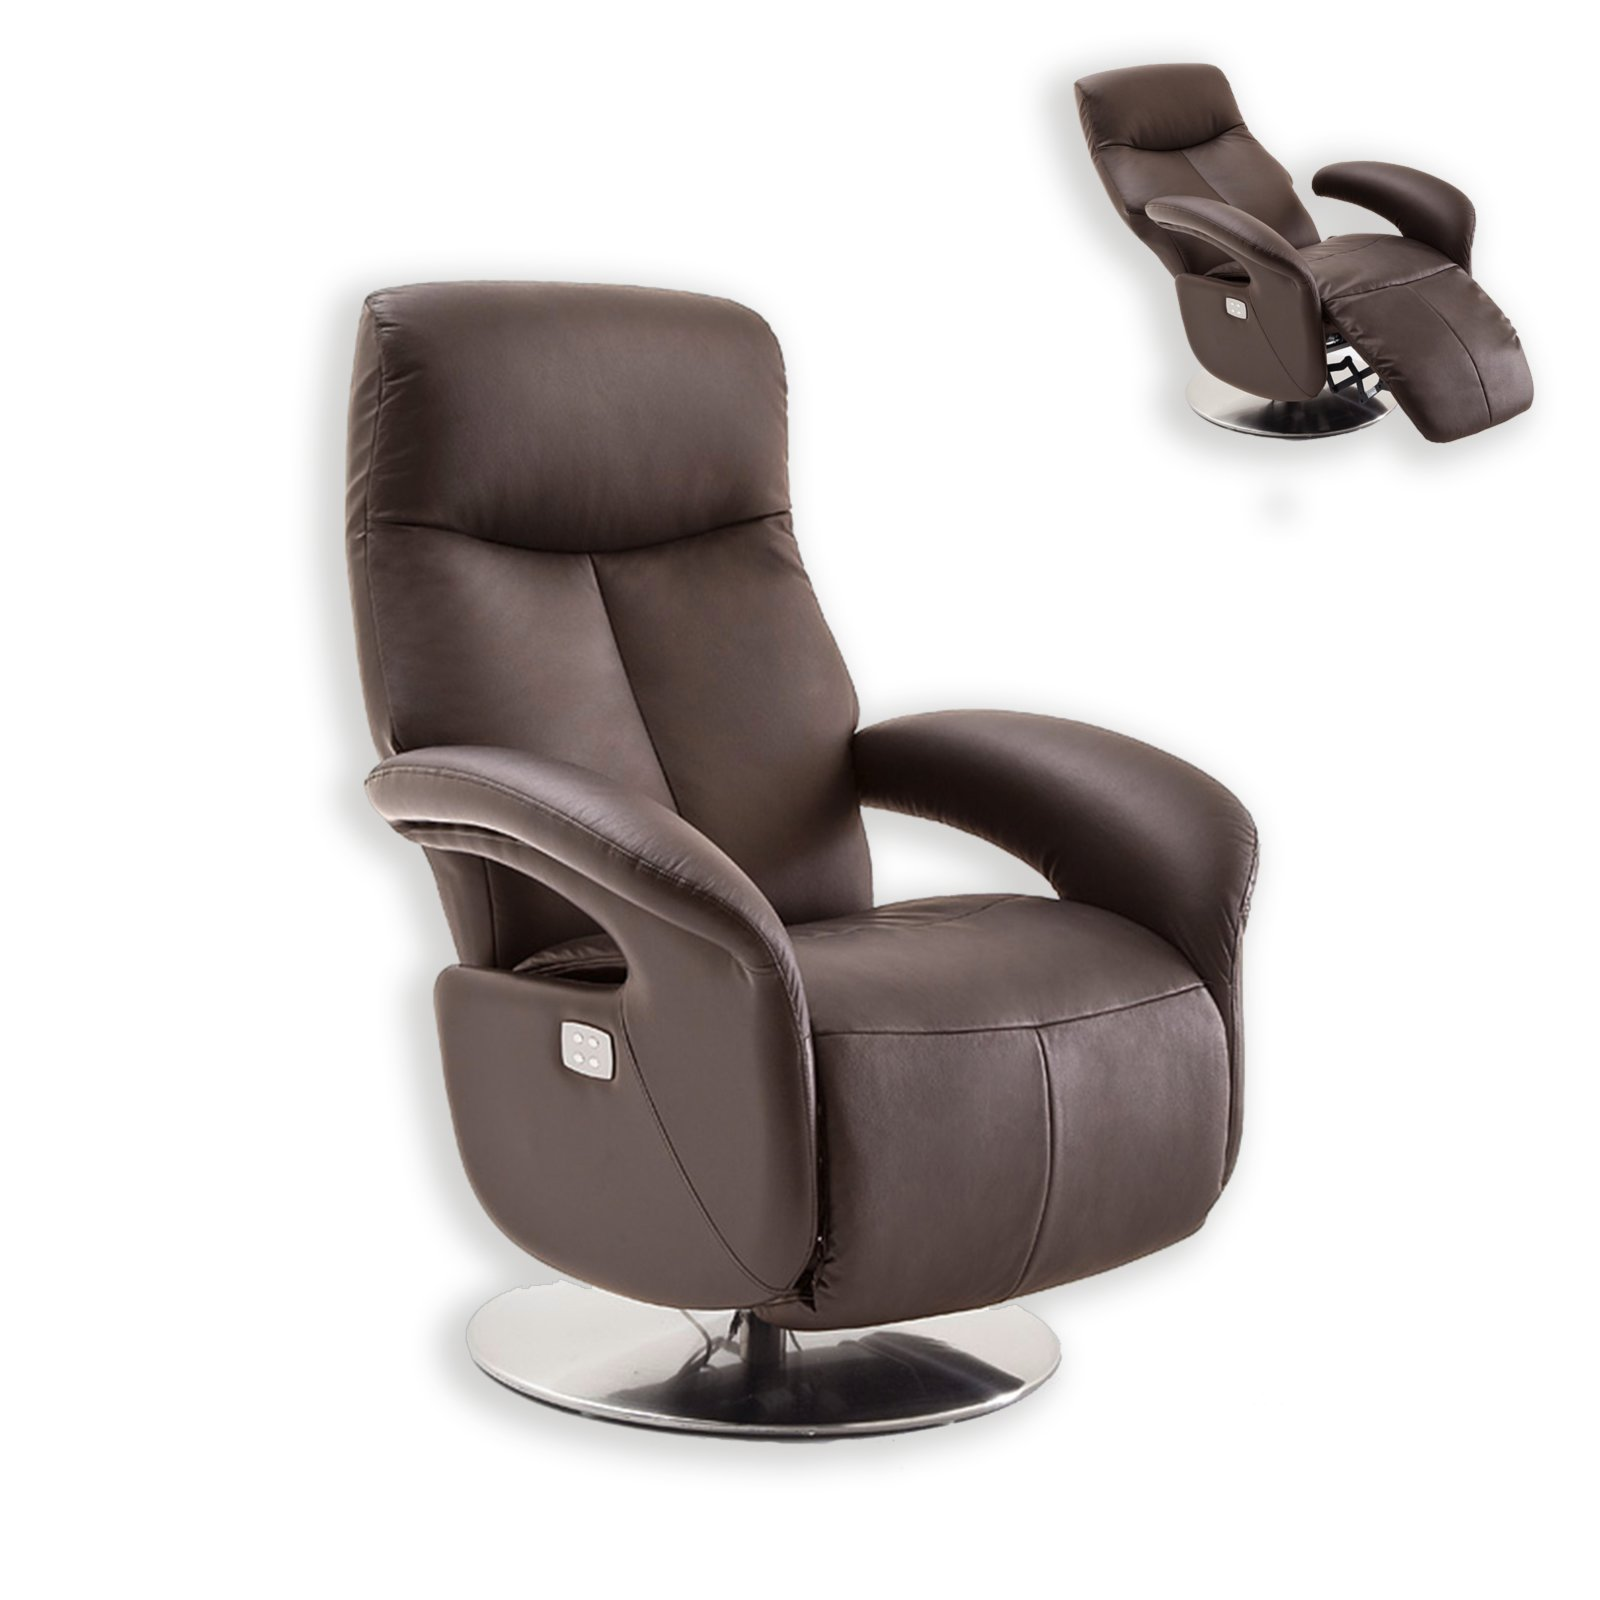 relaxstuhl braun mit funktionen fernseh relaxsessel sessel hocker m bel. Black Bedroom Furniture Sets. Home Design Ideas